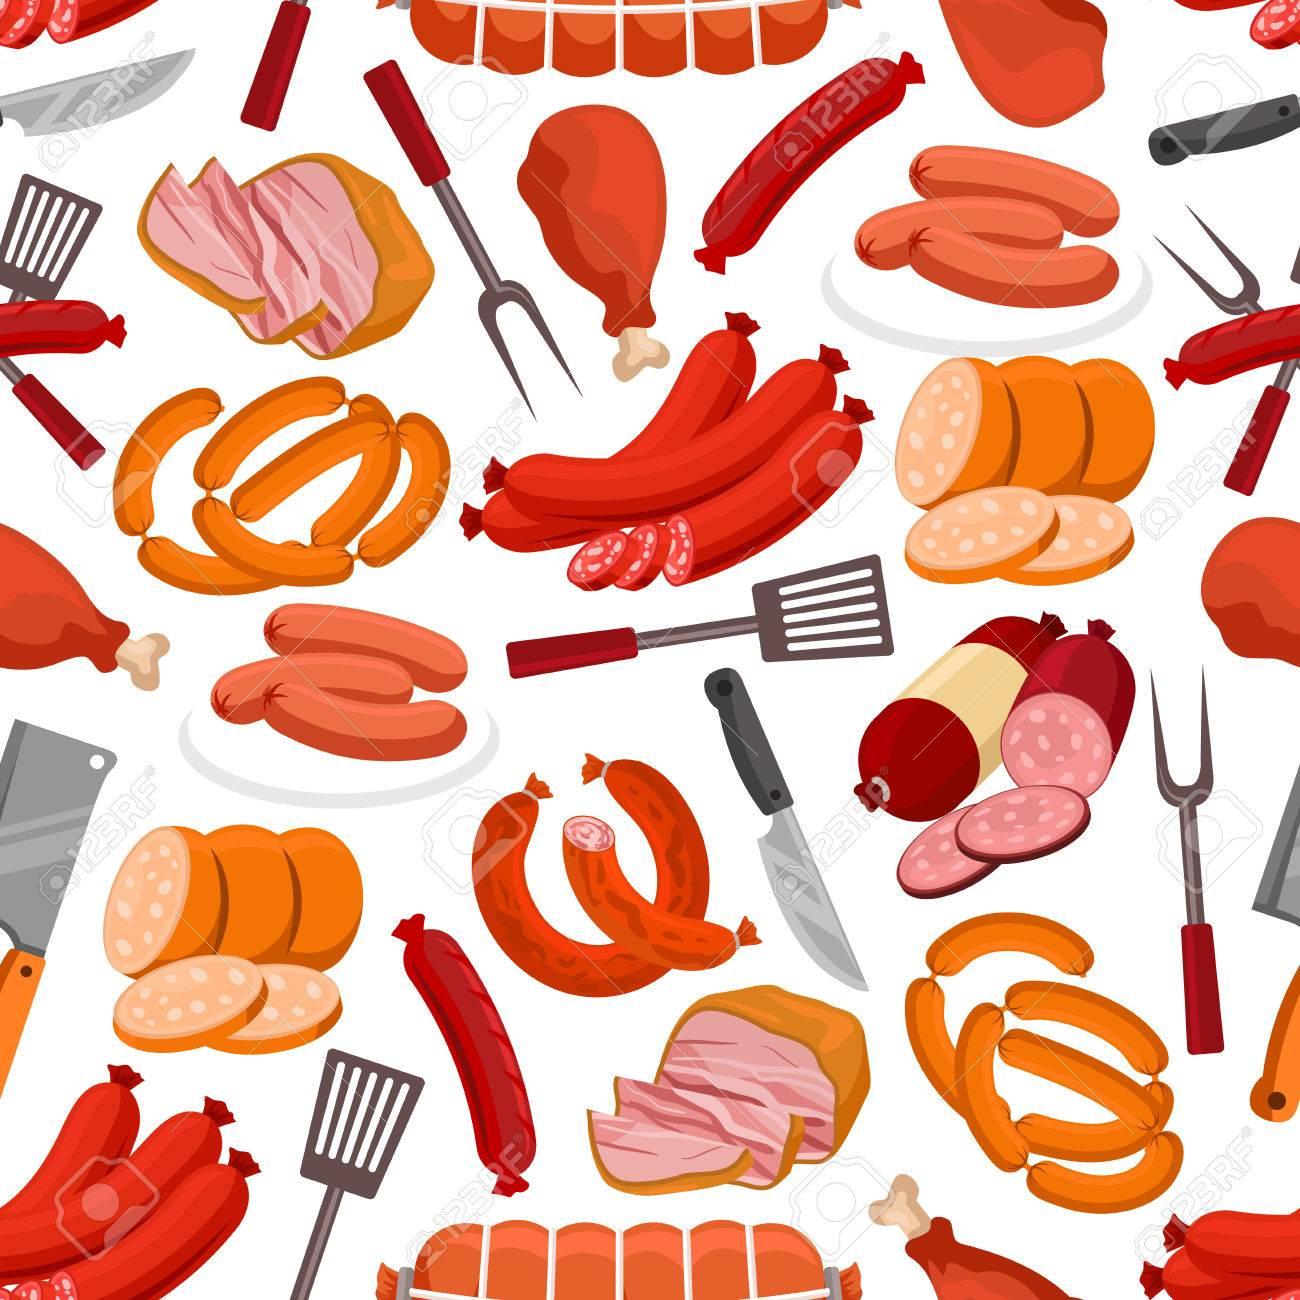 Meat delicatessen pattern. Vector seamless background of sausages, smoked bacon, roast beef, beef steak, ham, pork wurst, salami, schnitzel, grilled chicken leg, grill fork, knife, spatula - 66192292